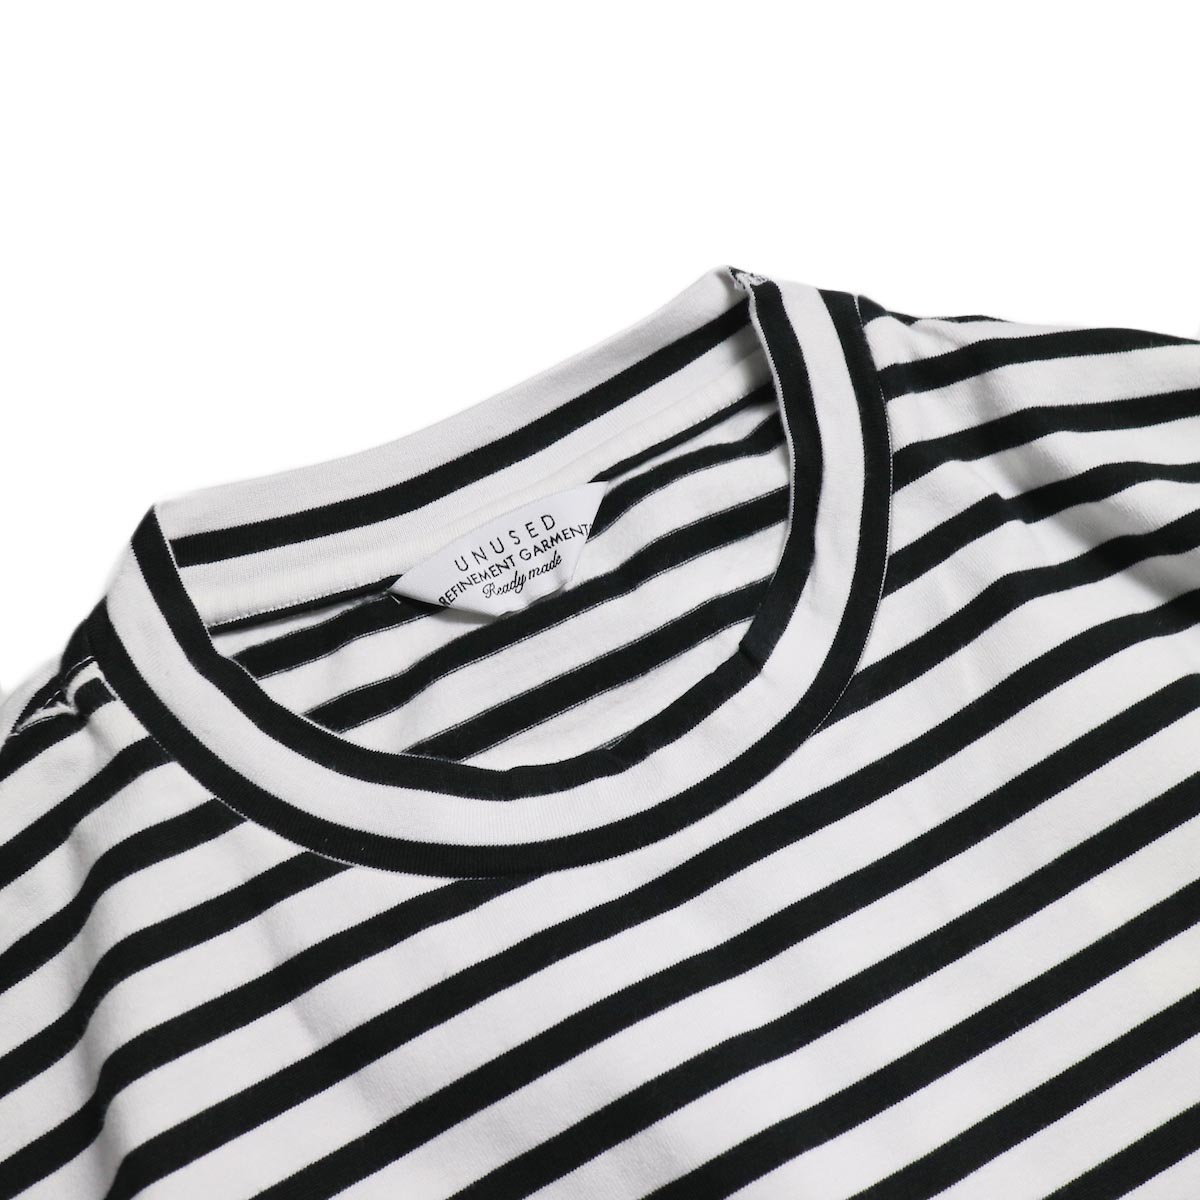 UNUSED / US1682 Long Sleeve Border T-Shirt -White/Black 襟